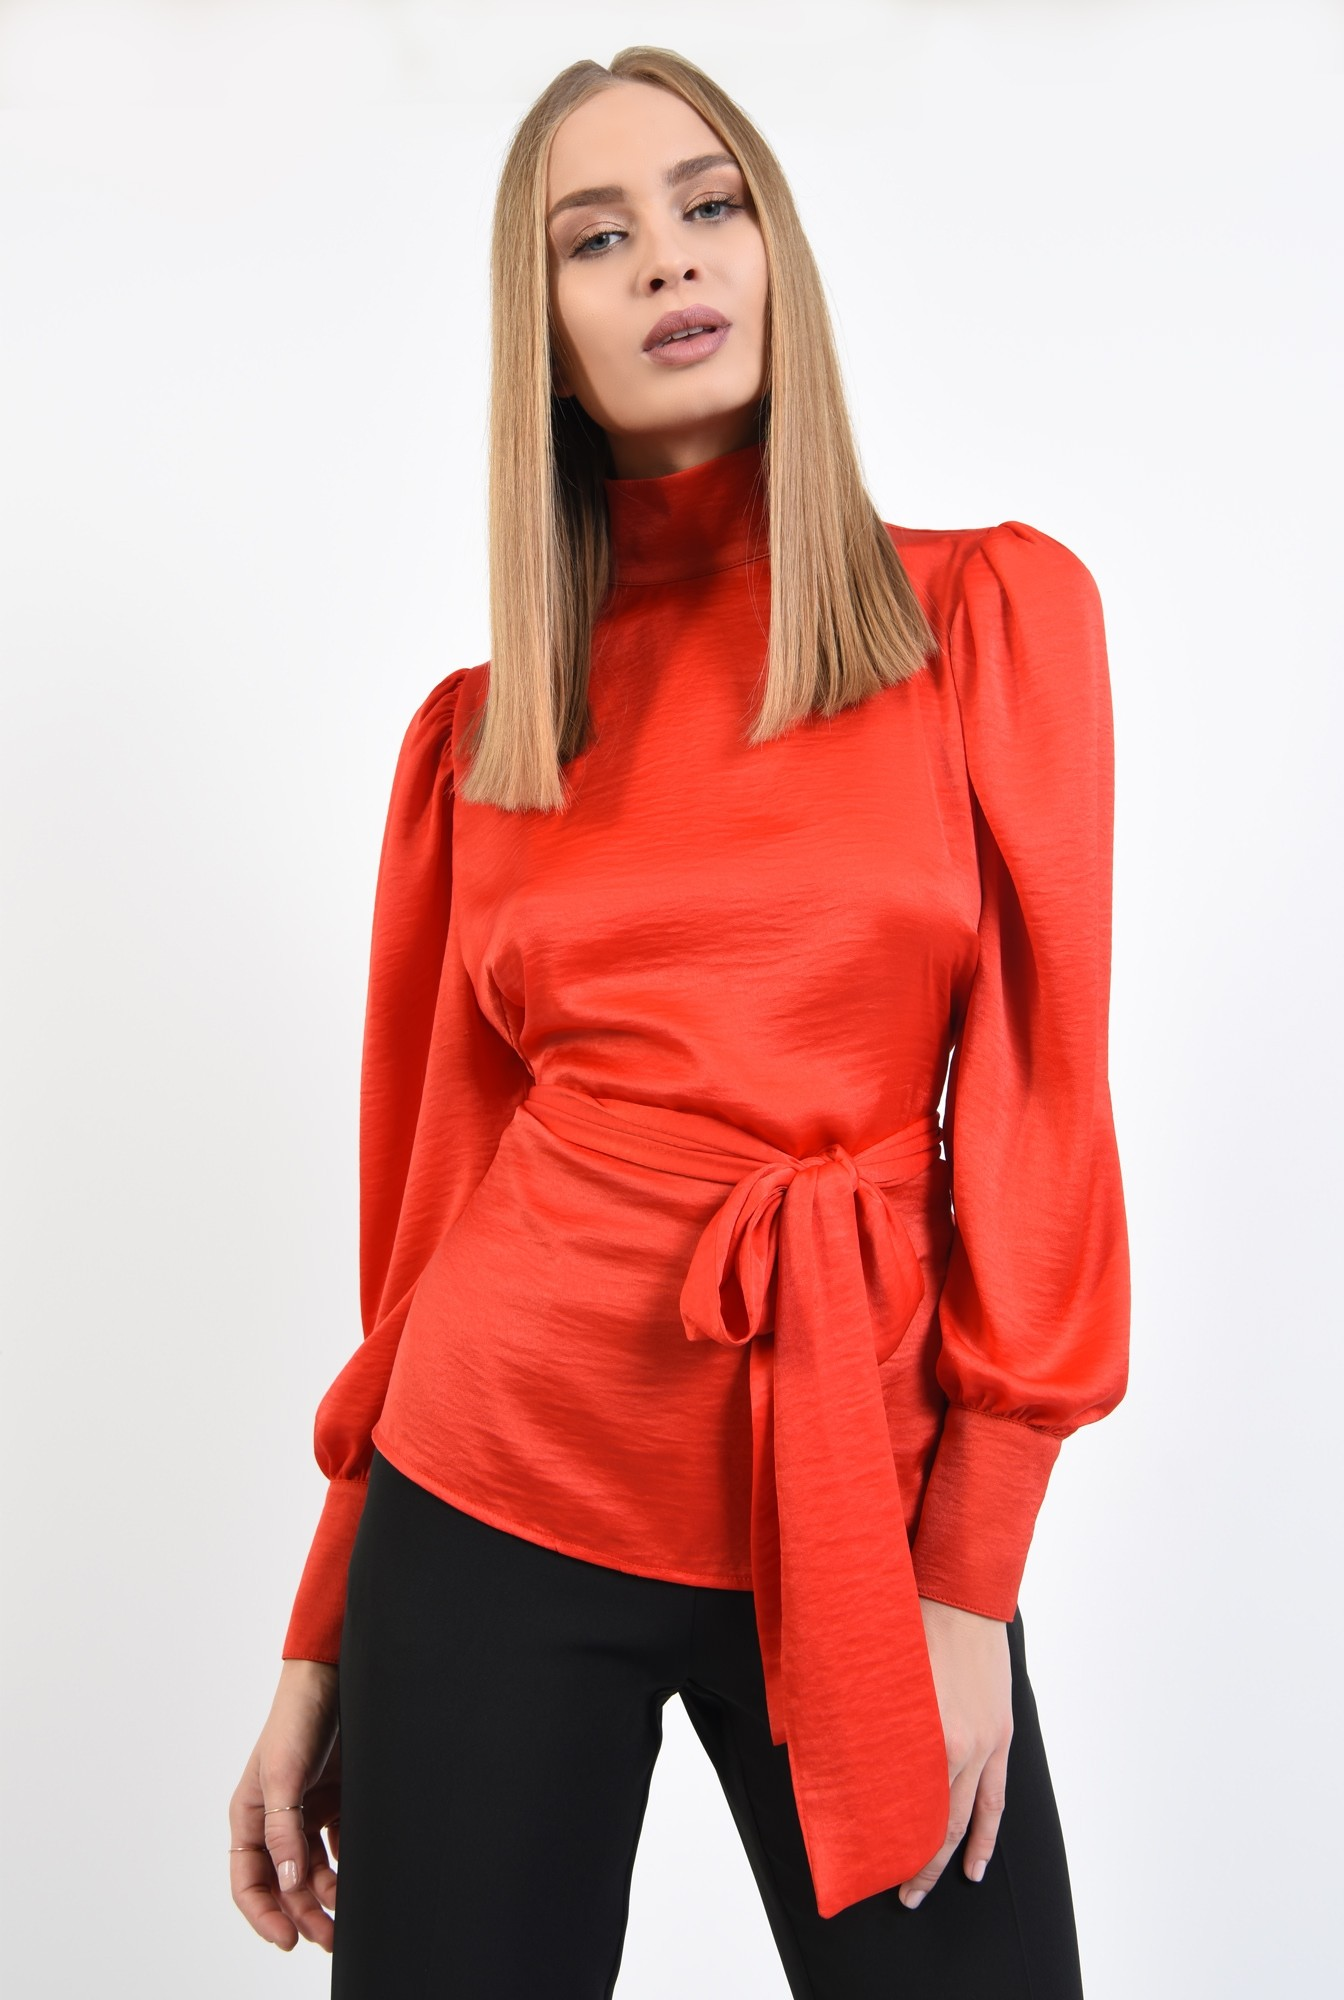 2 - 360 - bluza de ocazie, rosu, cu funda, cu maneci lungi